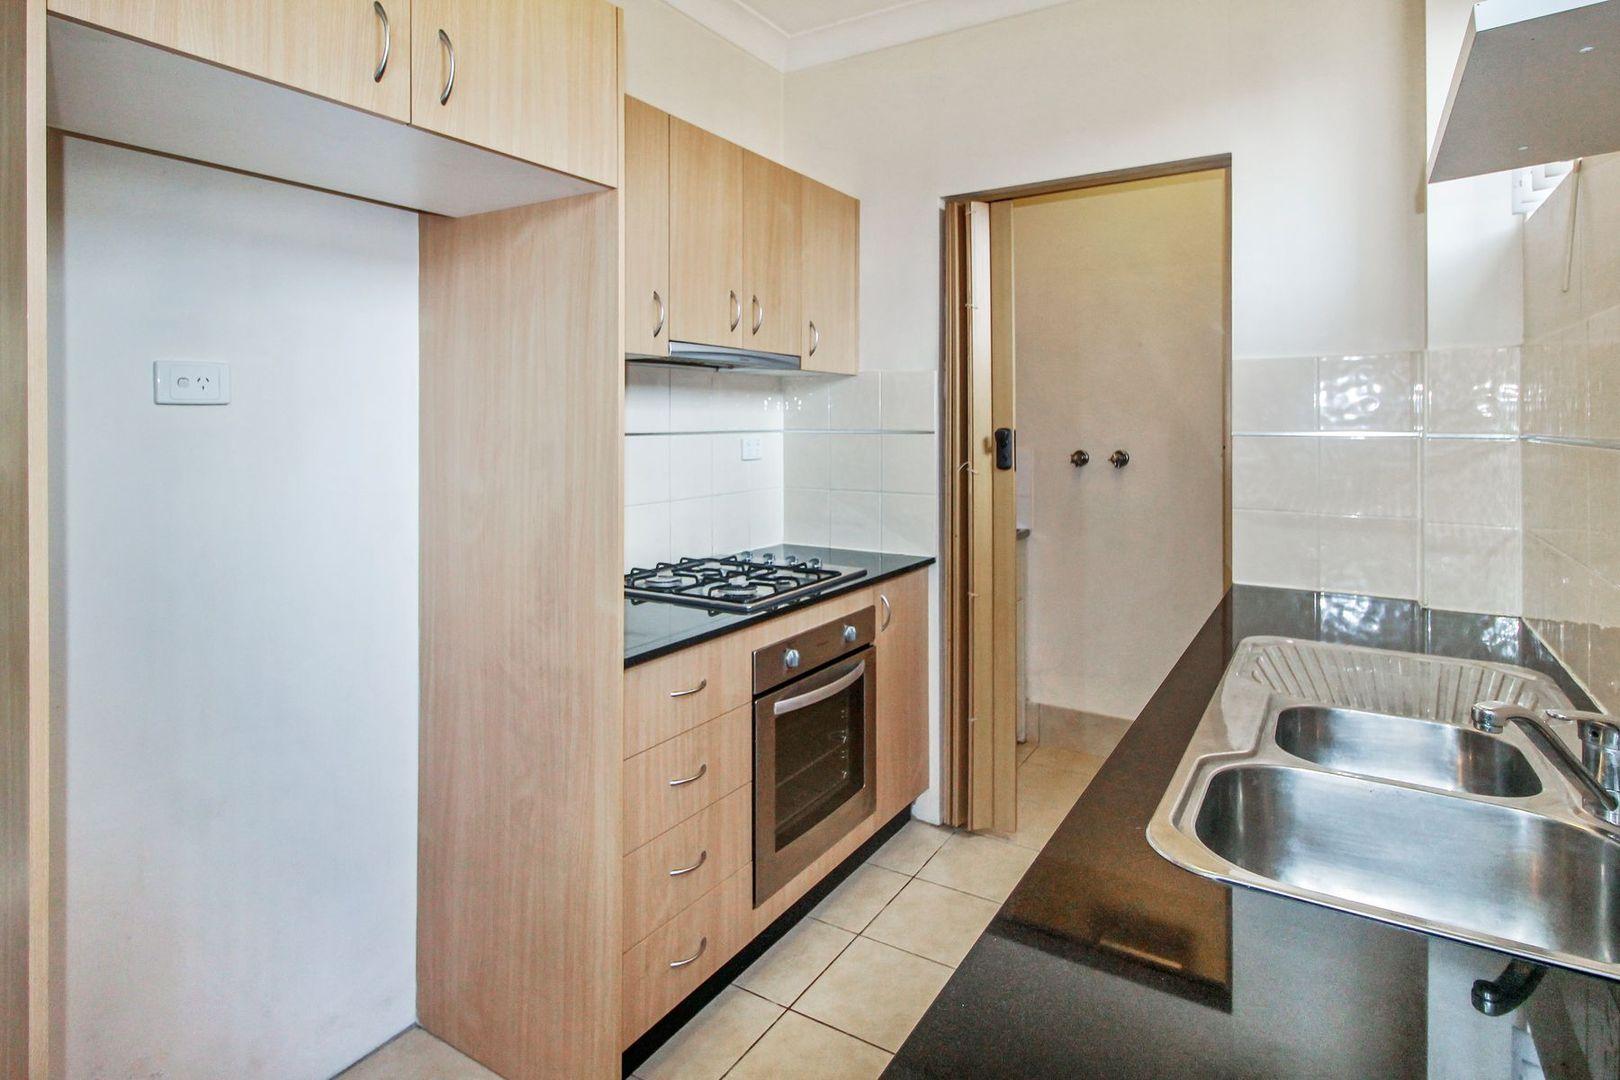 16/43 Bowden Street, Harris Park NSW 2150, Image 0